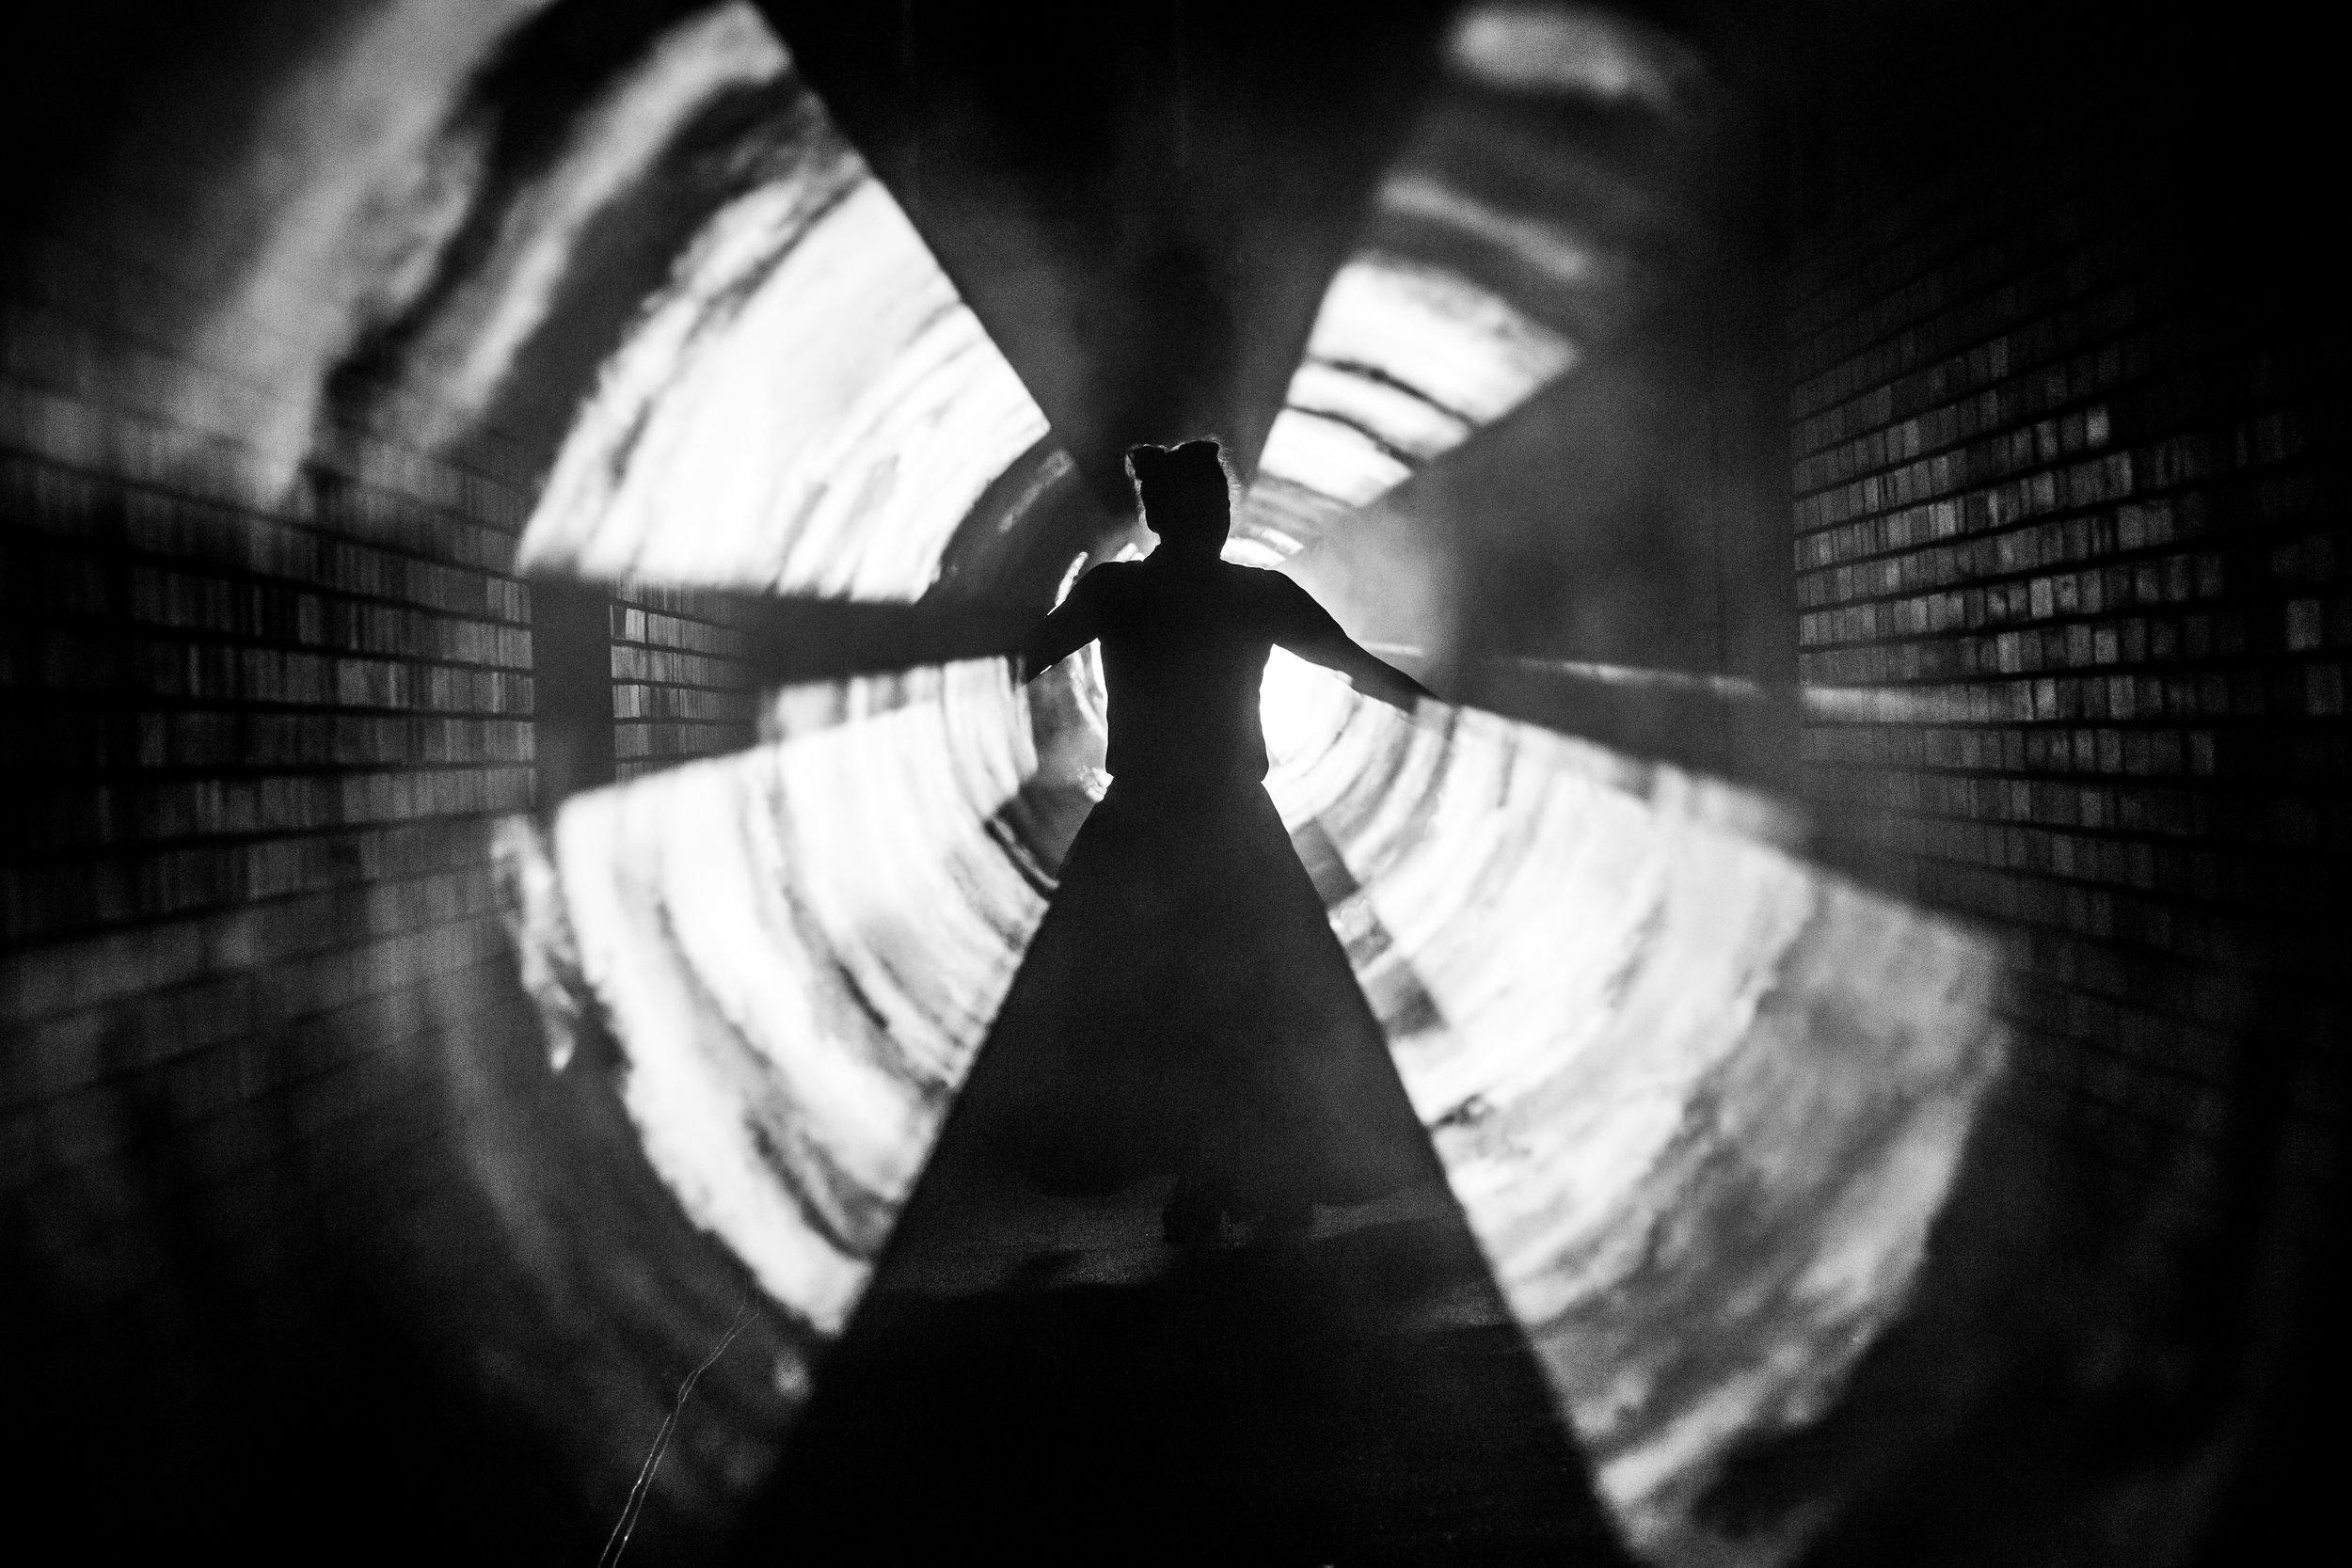 Antipode Tunnel_Vanessa Hafenbrädl and Ellen Oliver_Illuminus 2018_Photo by Aram Boghosian_1.jpg